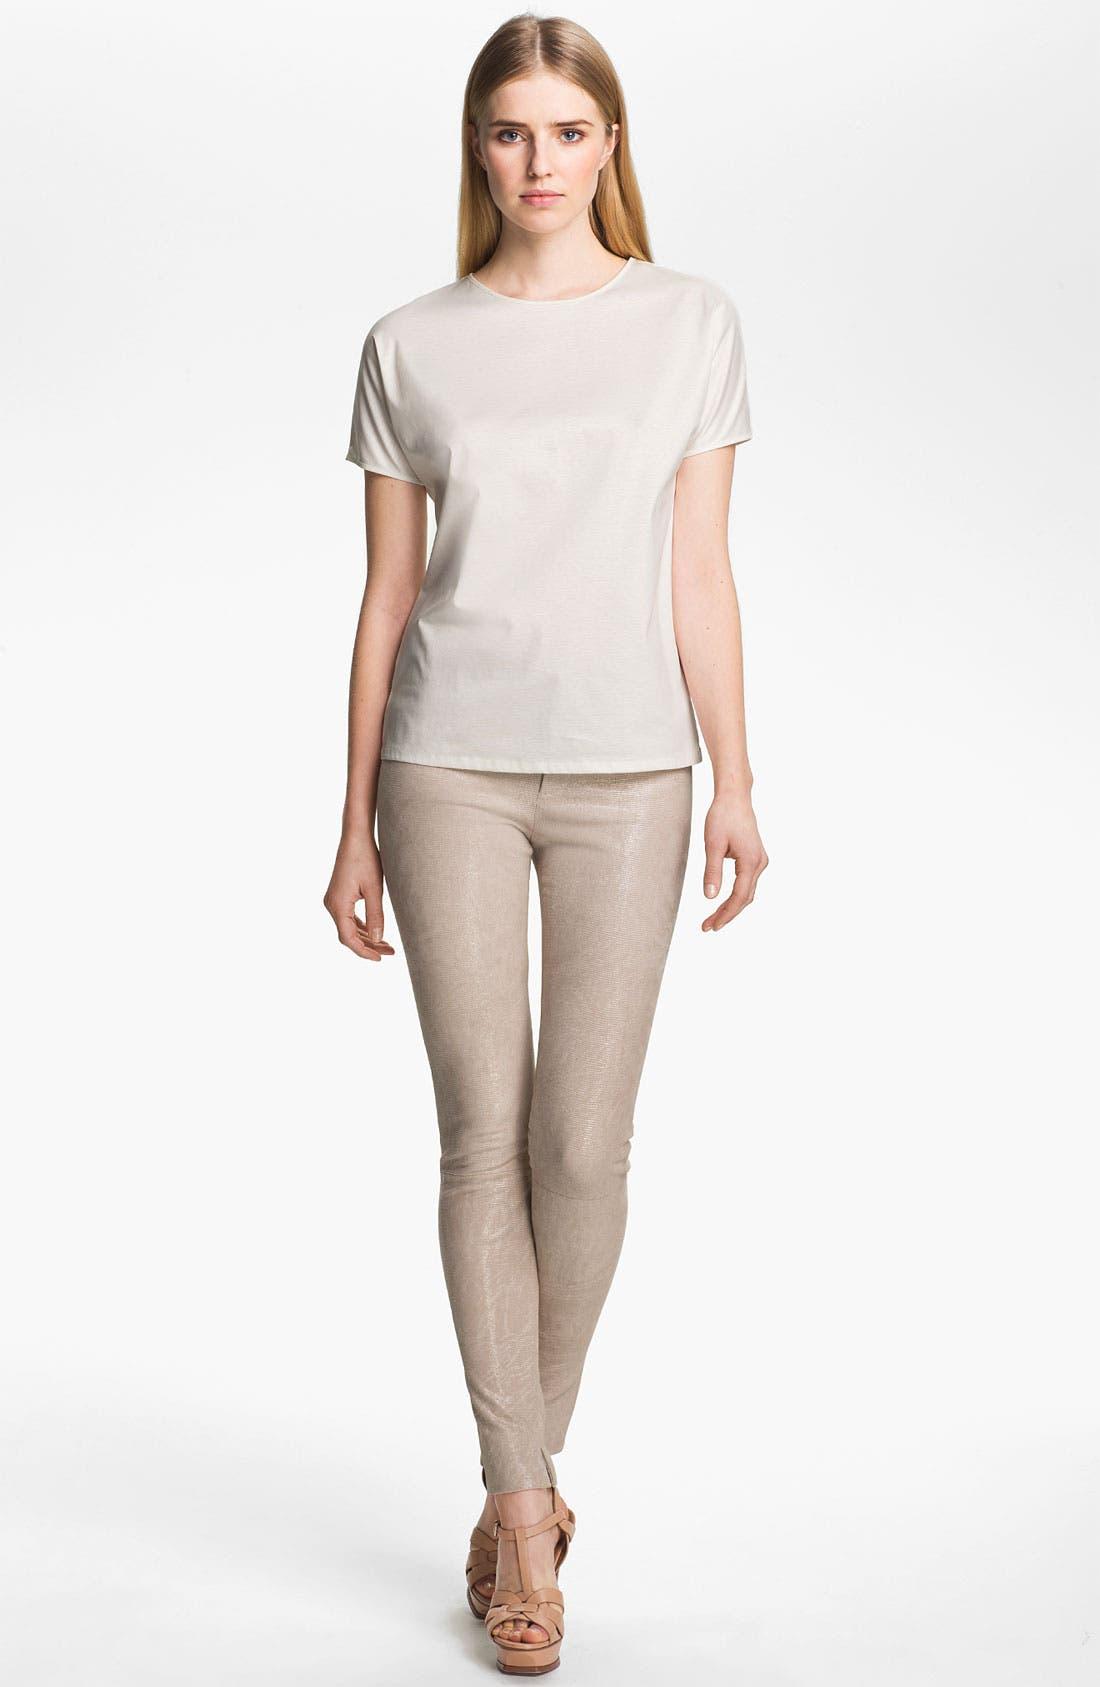 Main Image - J Brand Ready-to-Wear 'Ruth' Tee